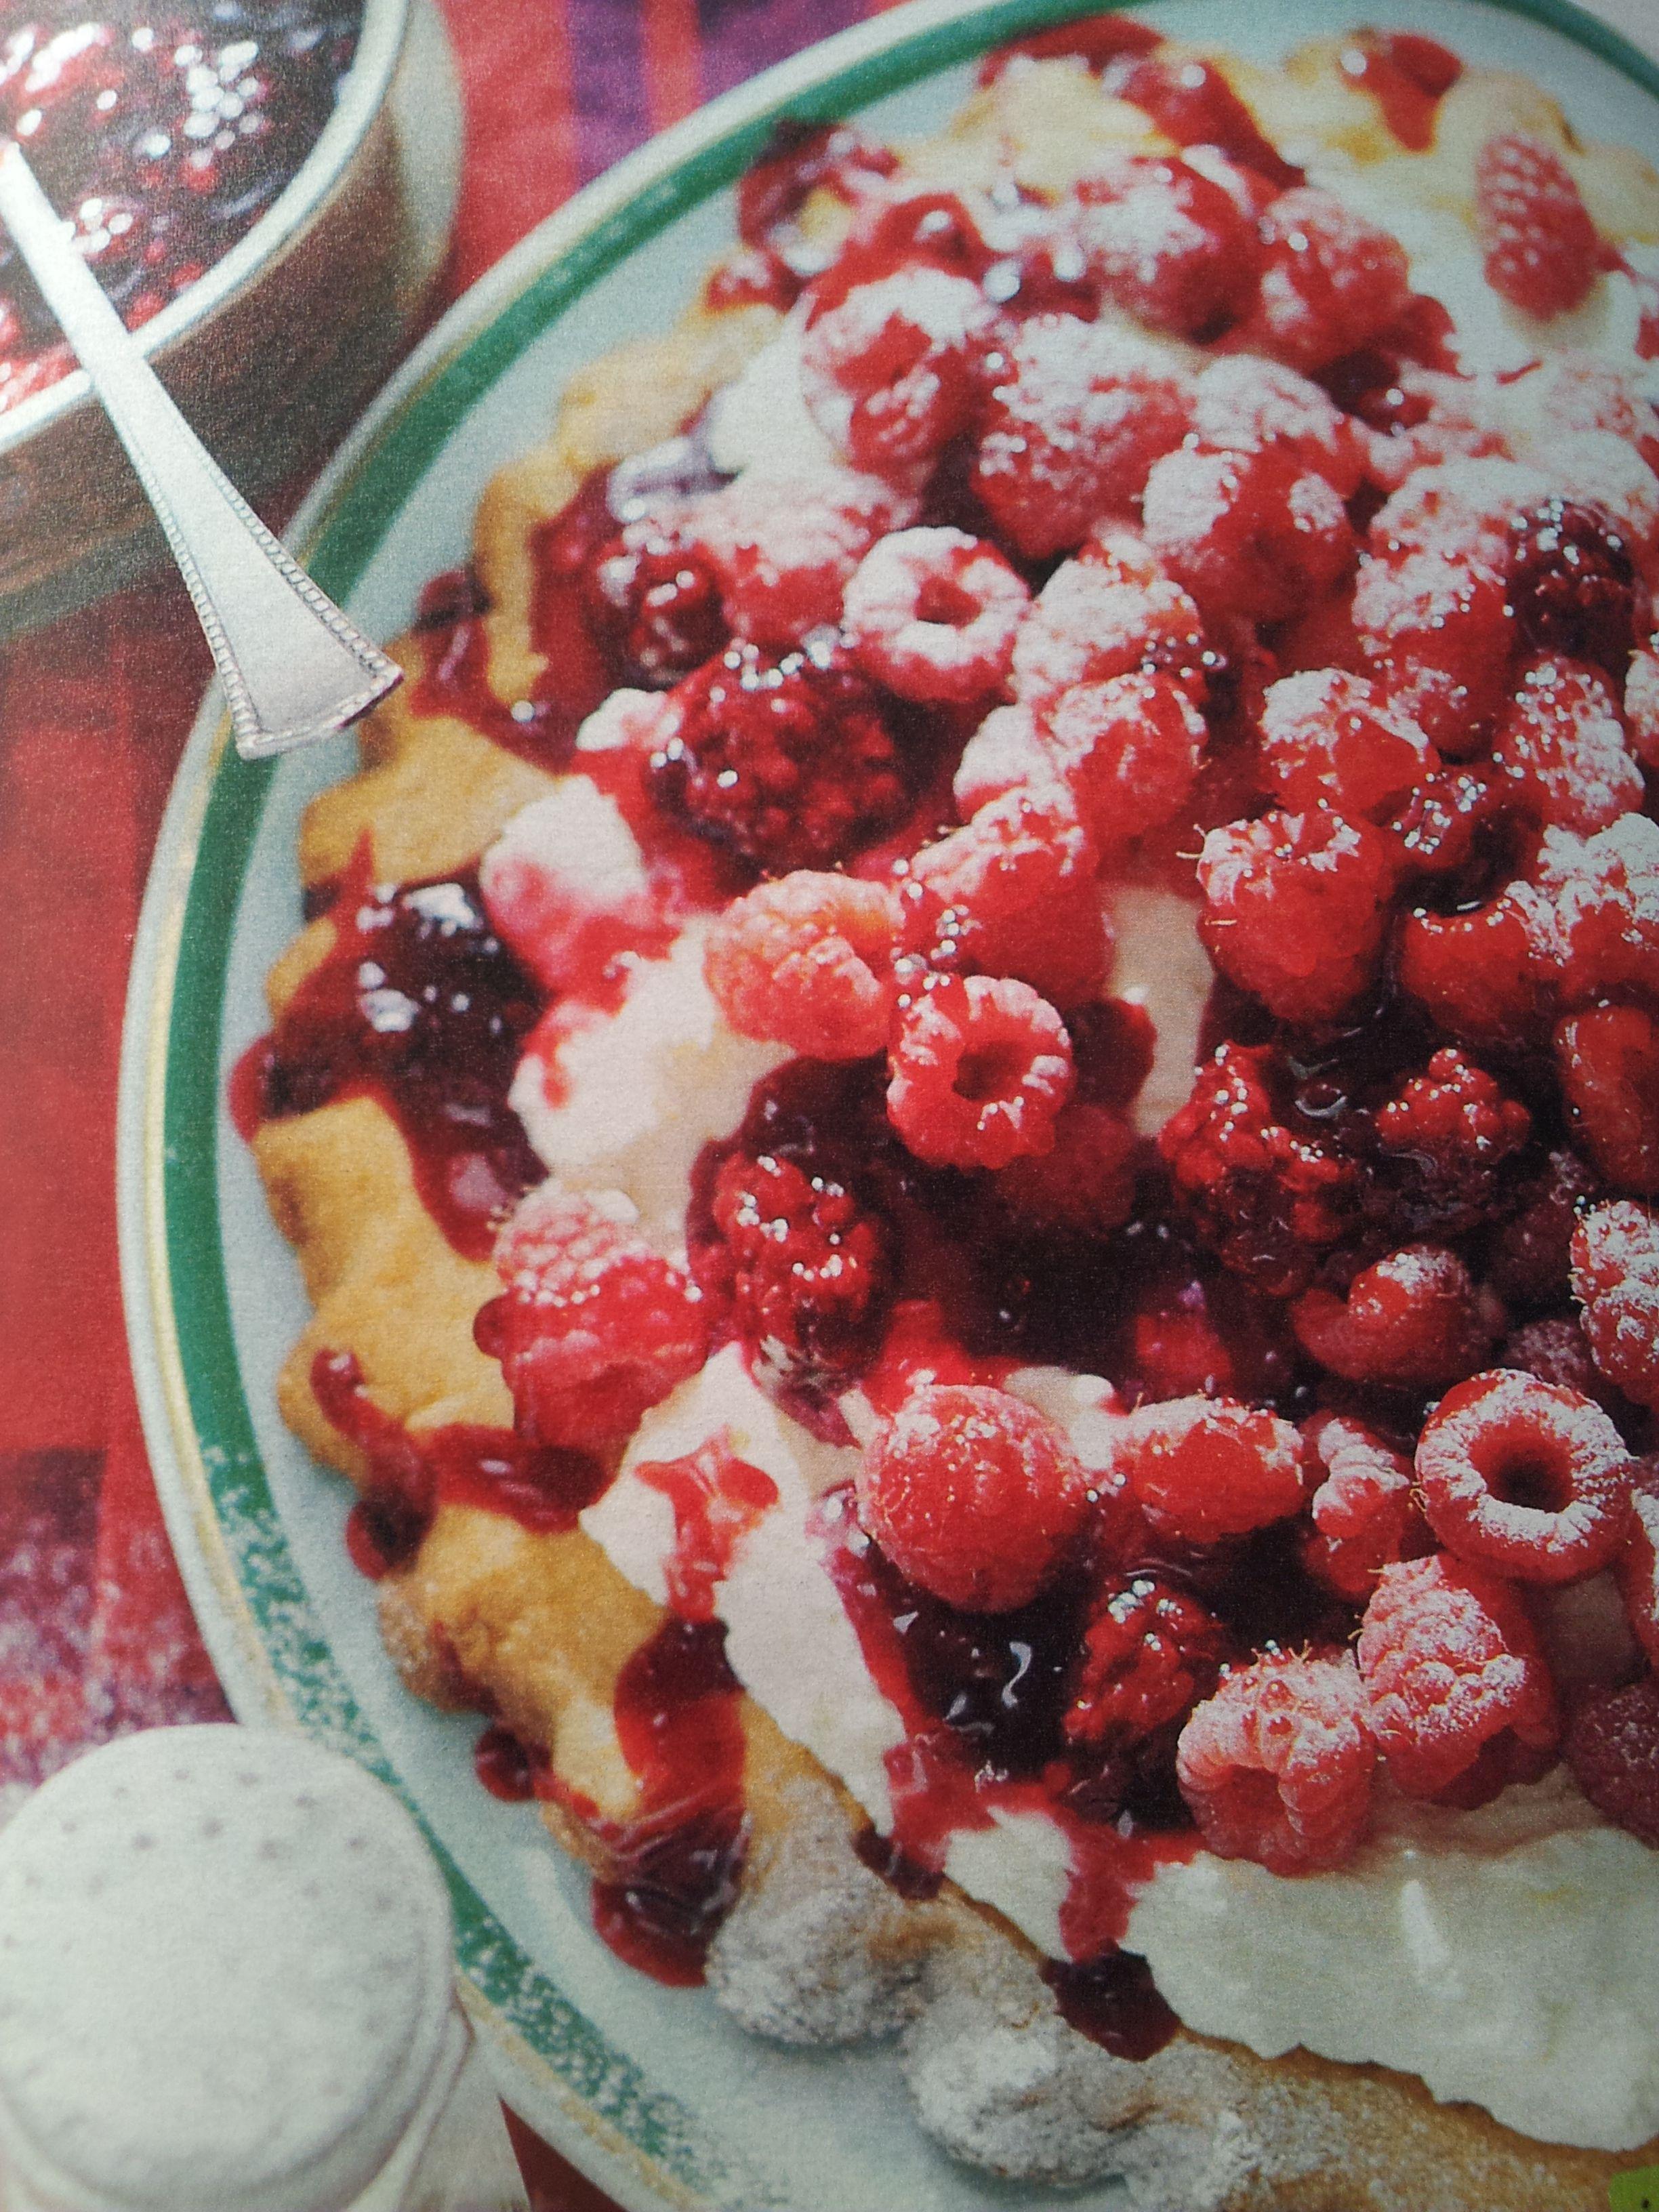 Mascarpone,1beker greek yoghurt,poedersuiker, lange vingers,diksap,dessertsaus aardbeien,1bakje aardbeien,citroensap